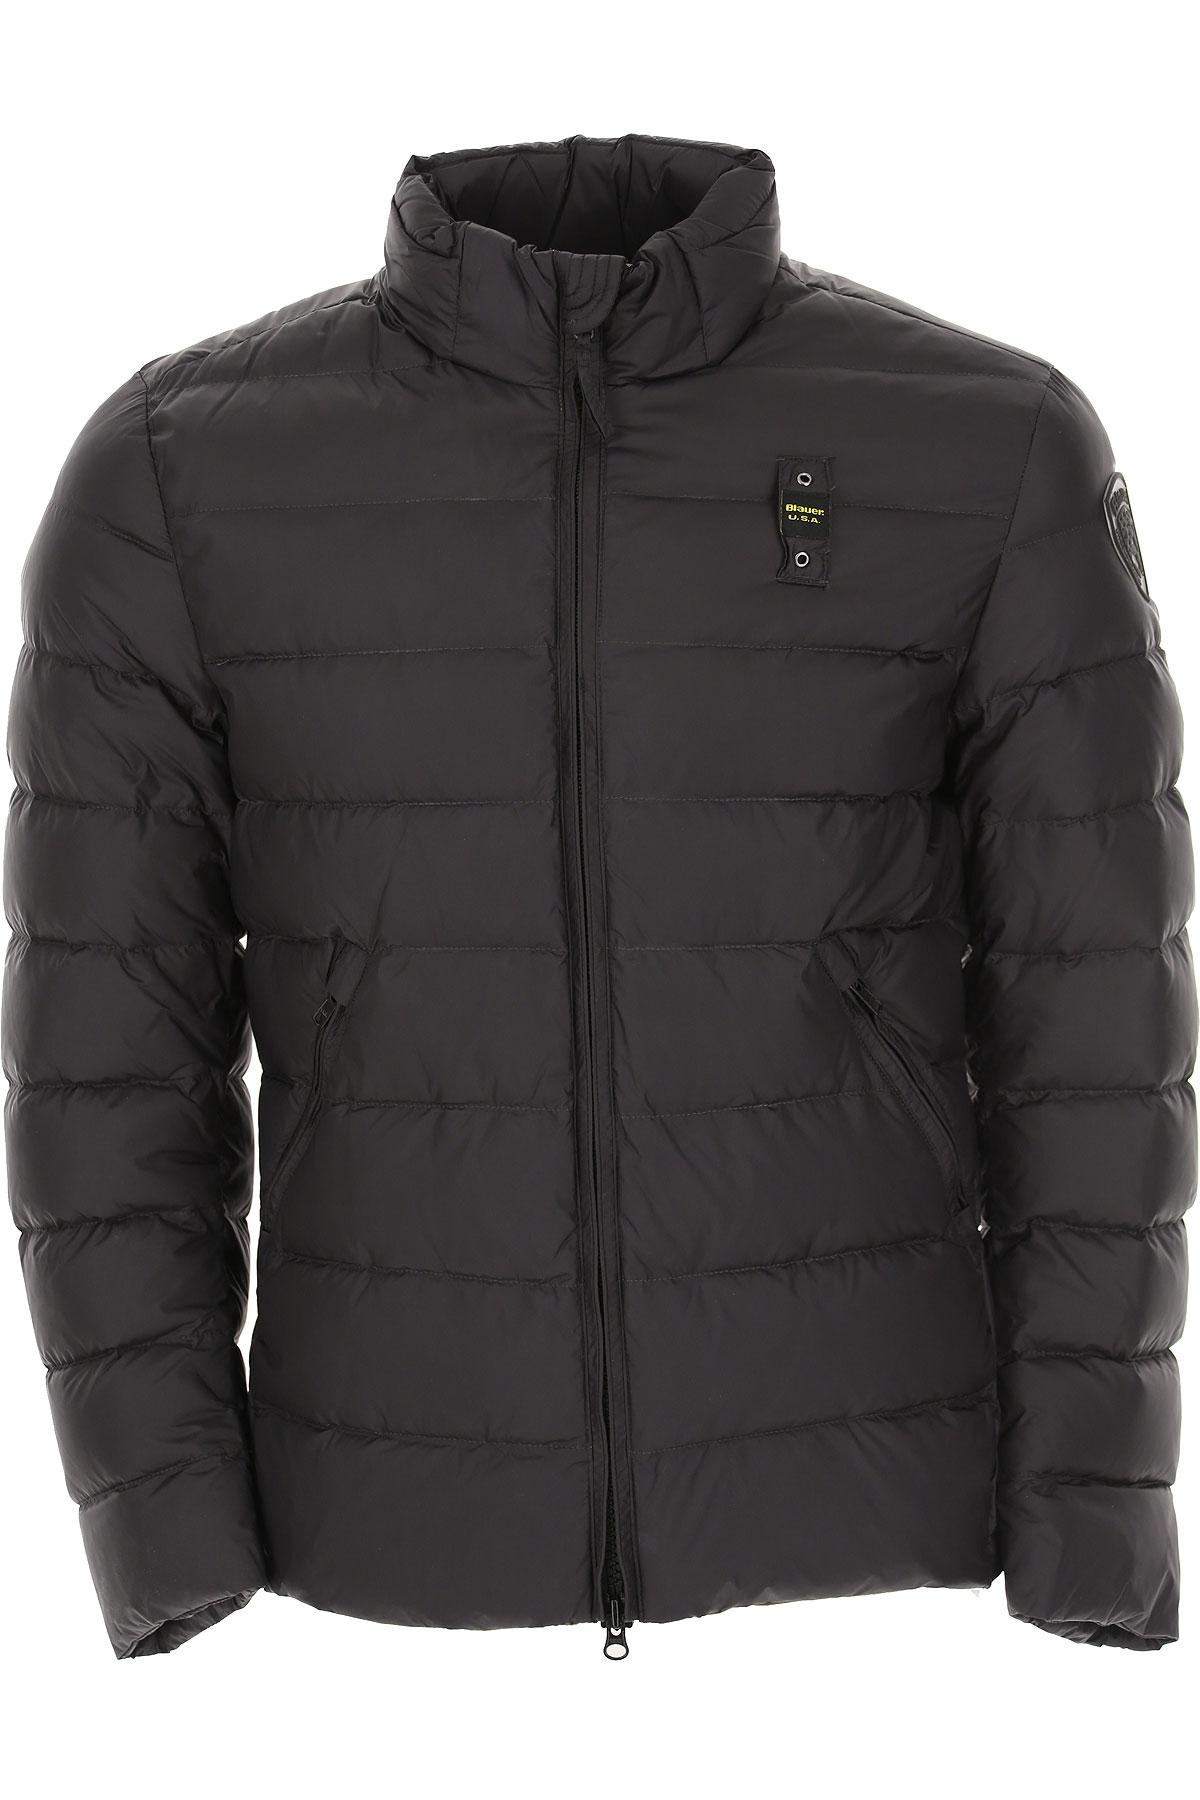 Blauer Down Jacket for Men, Puffer Ski Jacket On Sale, Ink Blue, polyester, 2019, L M S XL